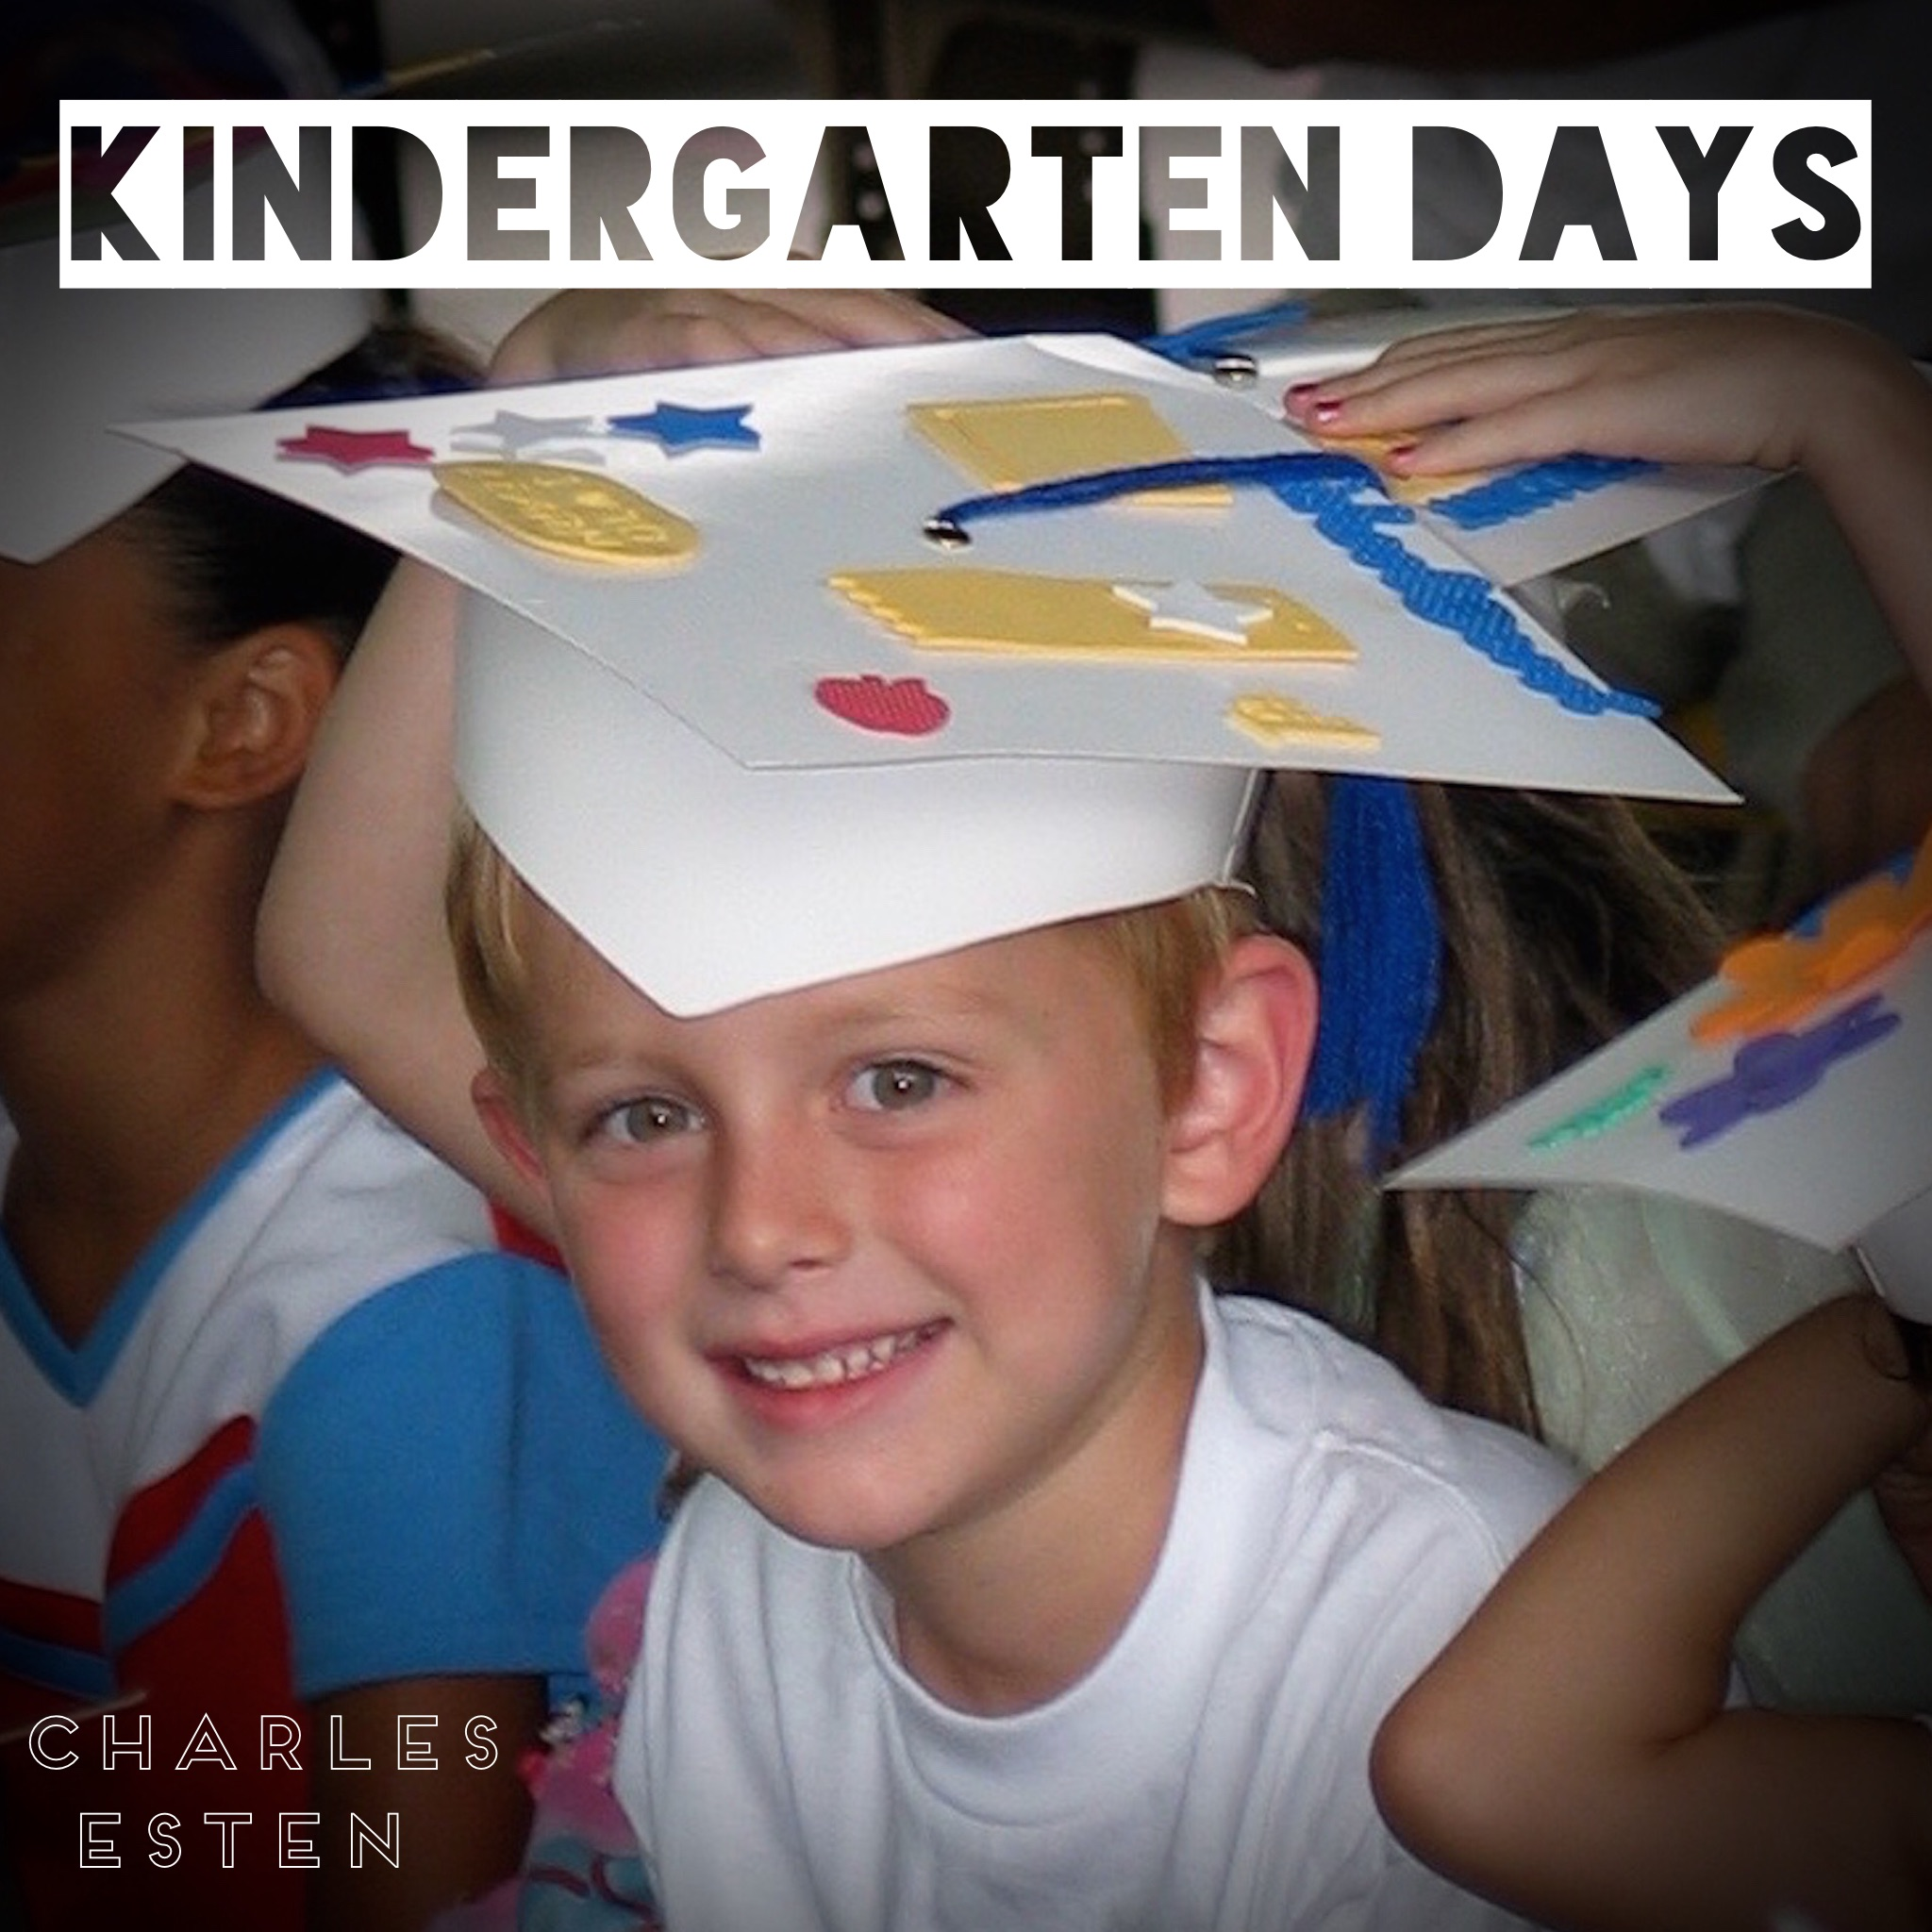 Kindergarten Days